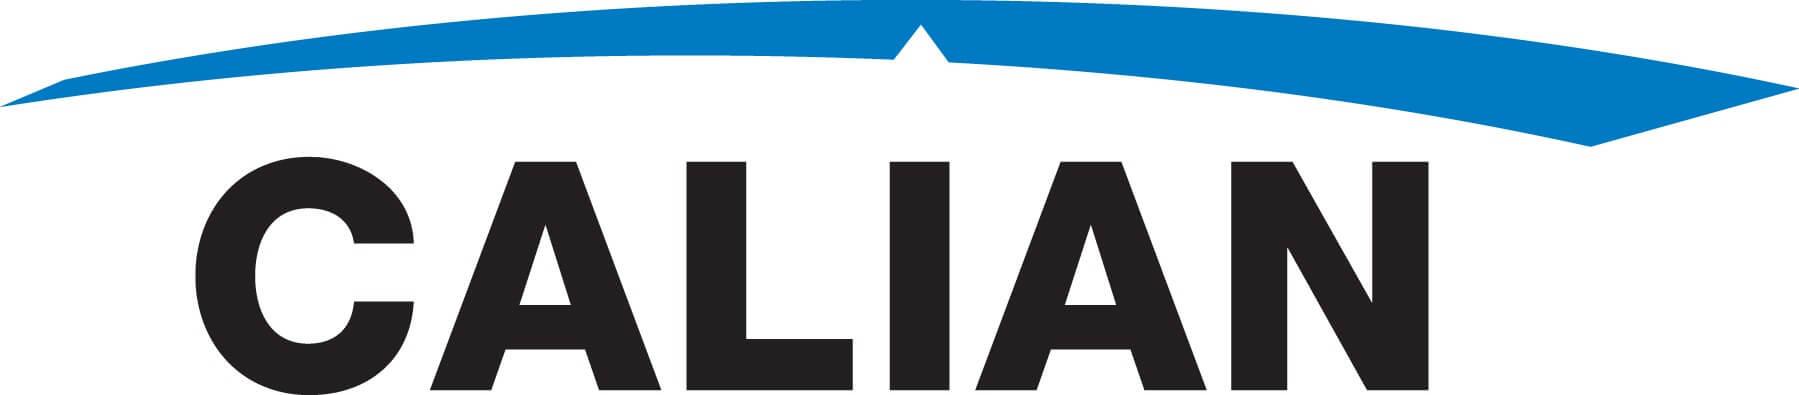 CALIAN_logo_pr